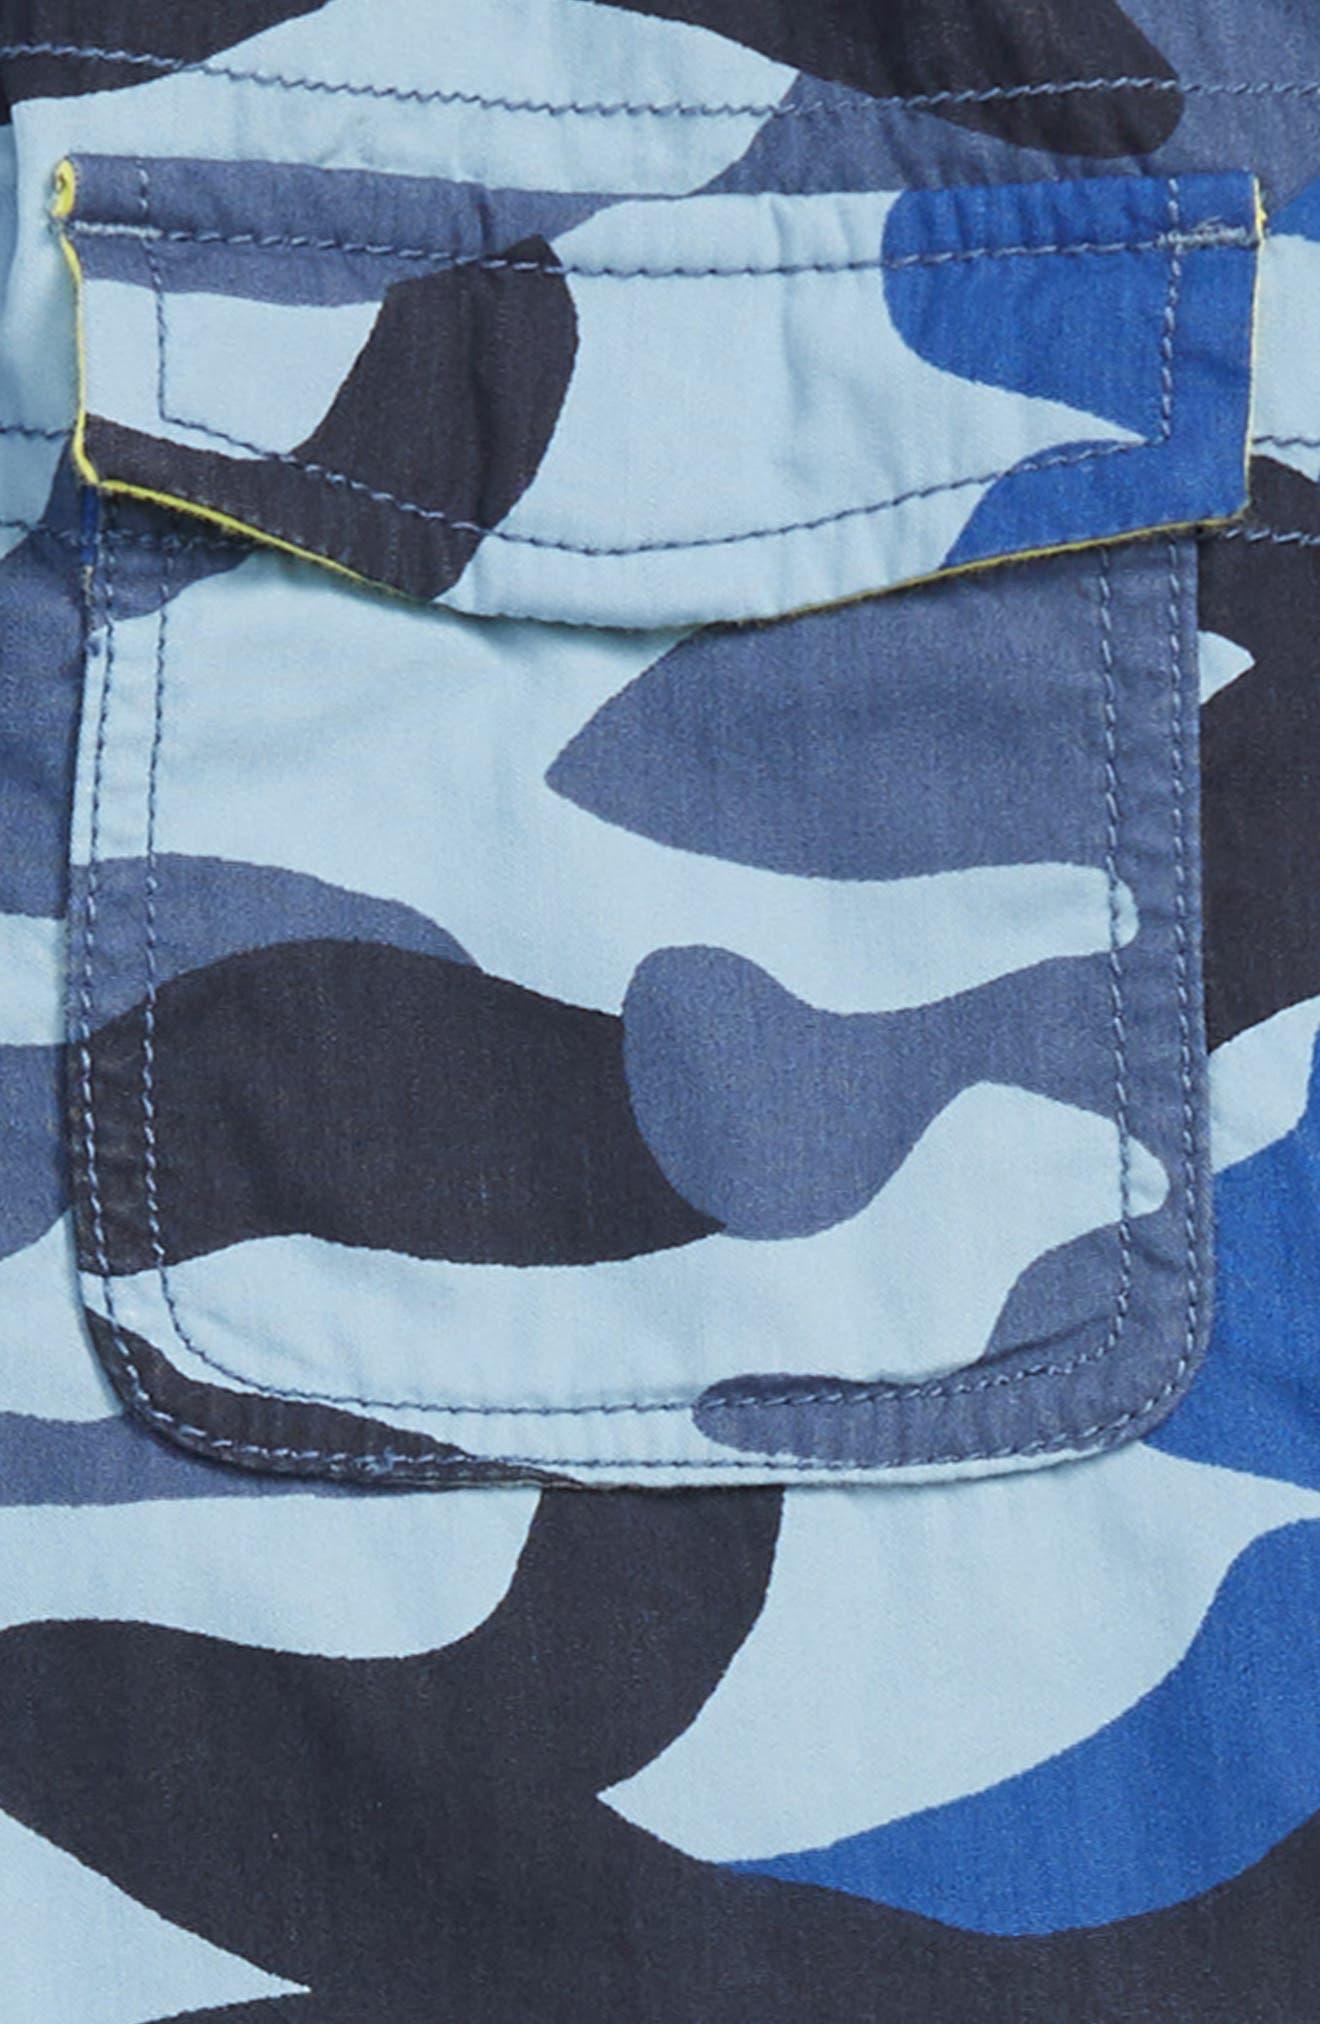 Techno Convertible Zip Off Pants,                             Alternate thumbnail 3, color,                             COLLEGE BLUE CAMO